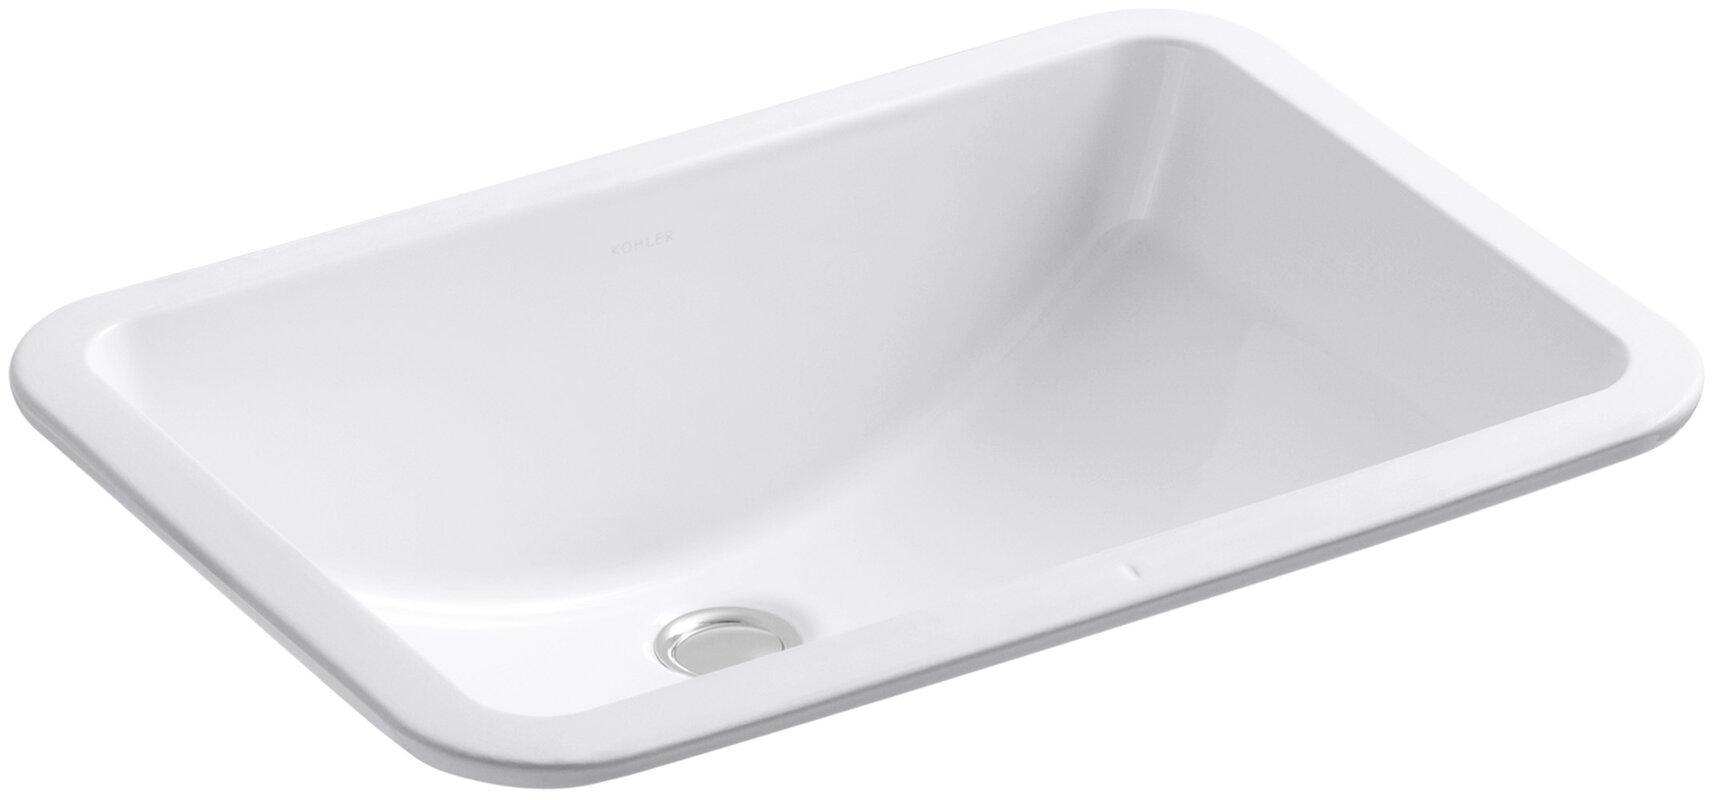 Kohler ladena rectangular undermount bathroom sink with for Kohler ladena white undermount rectangular bathroom sink with overflow